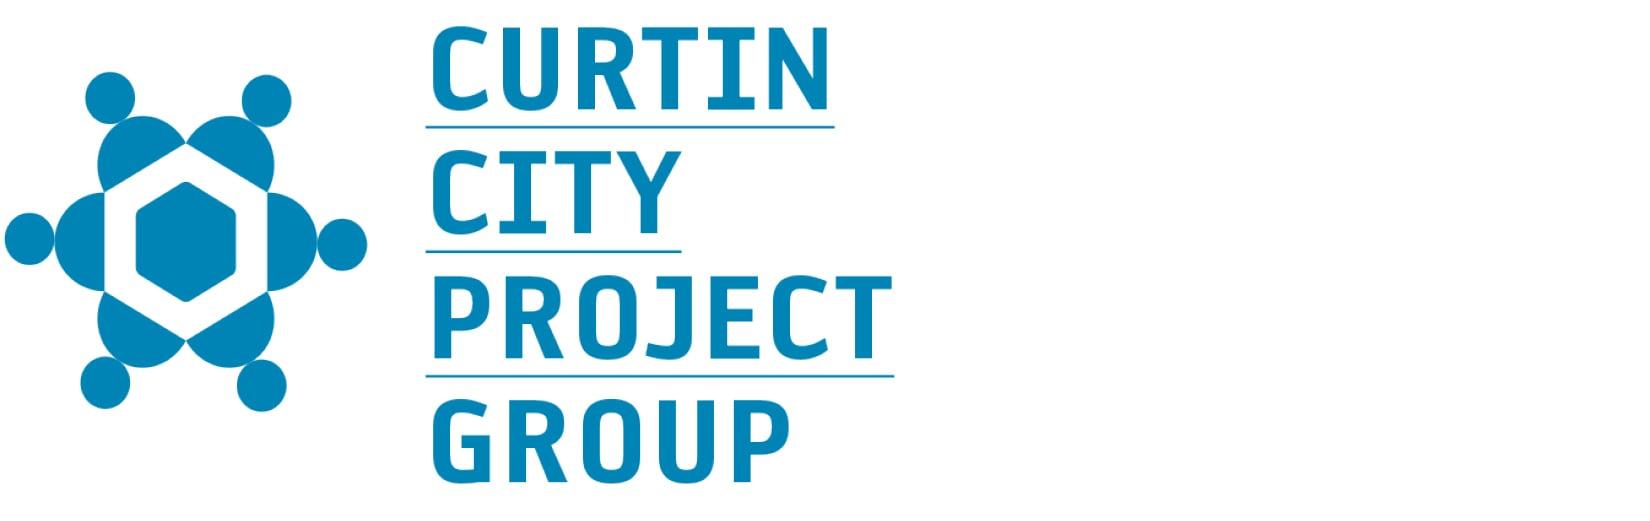 City_Group_Logos32.jpg